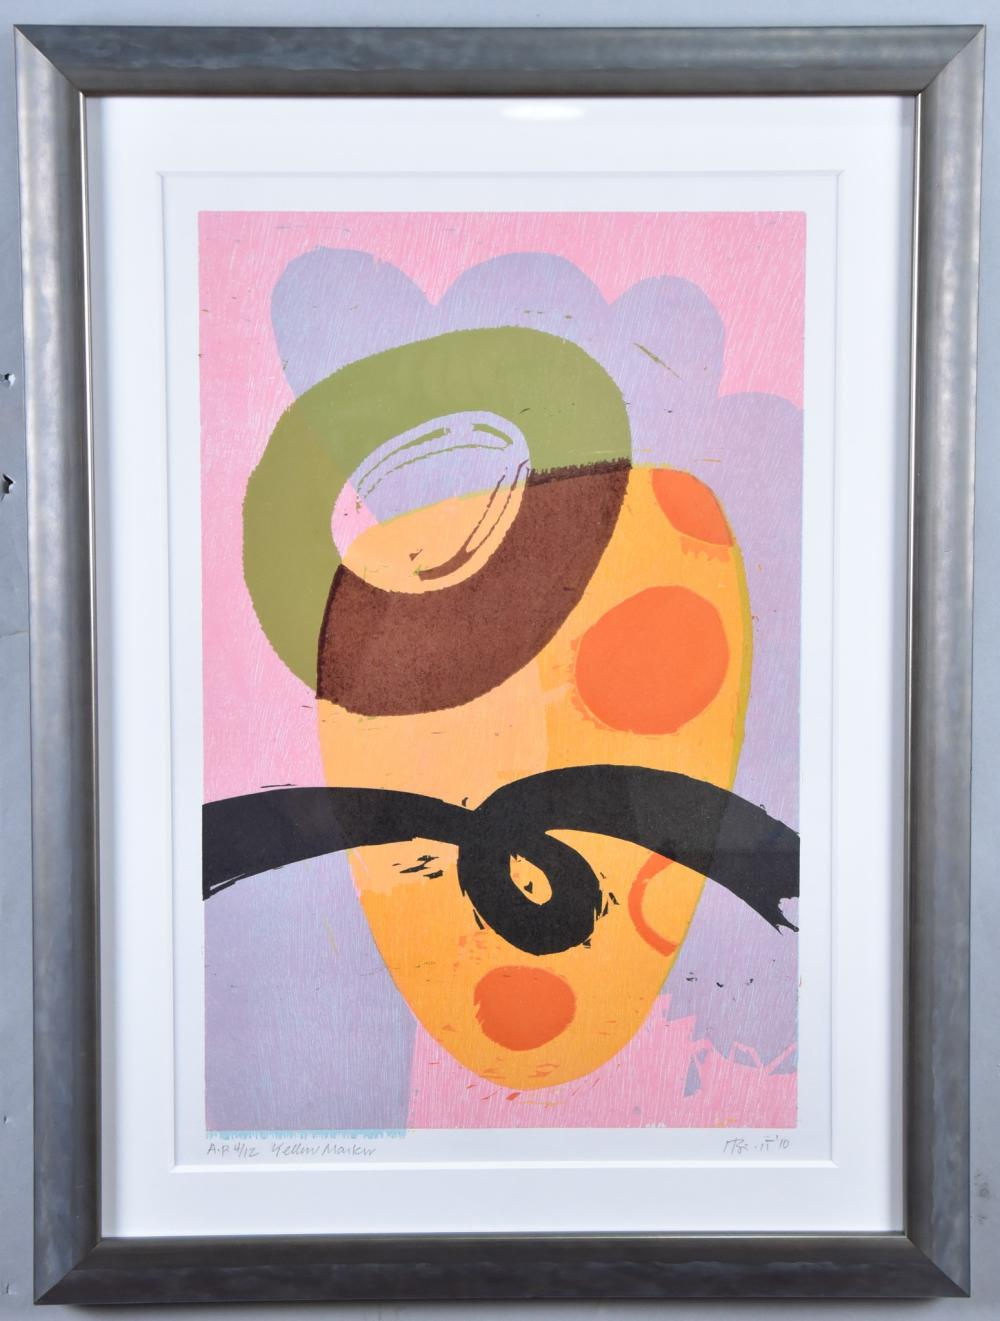 Charles Hewitt, New York (b. 1946), Yellow Maku, 2010, color woodcut, a.p. ed. 4/12, 20 x 13 inches